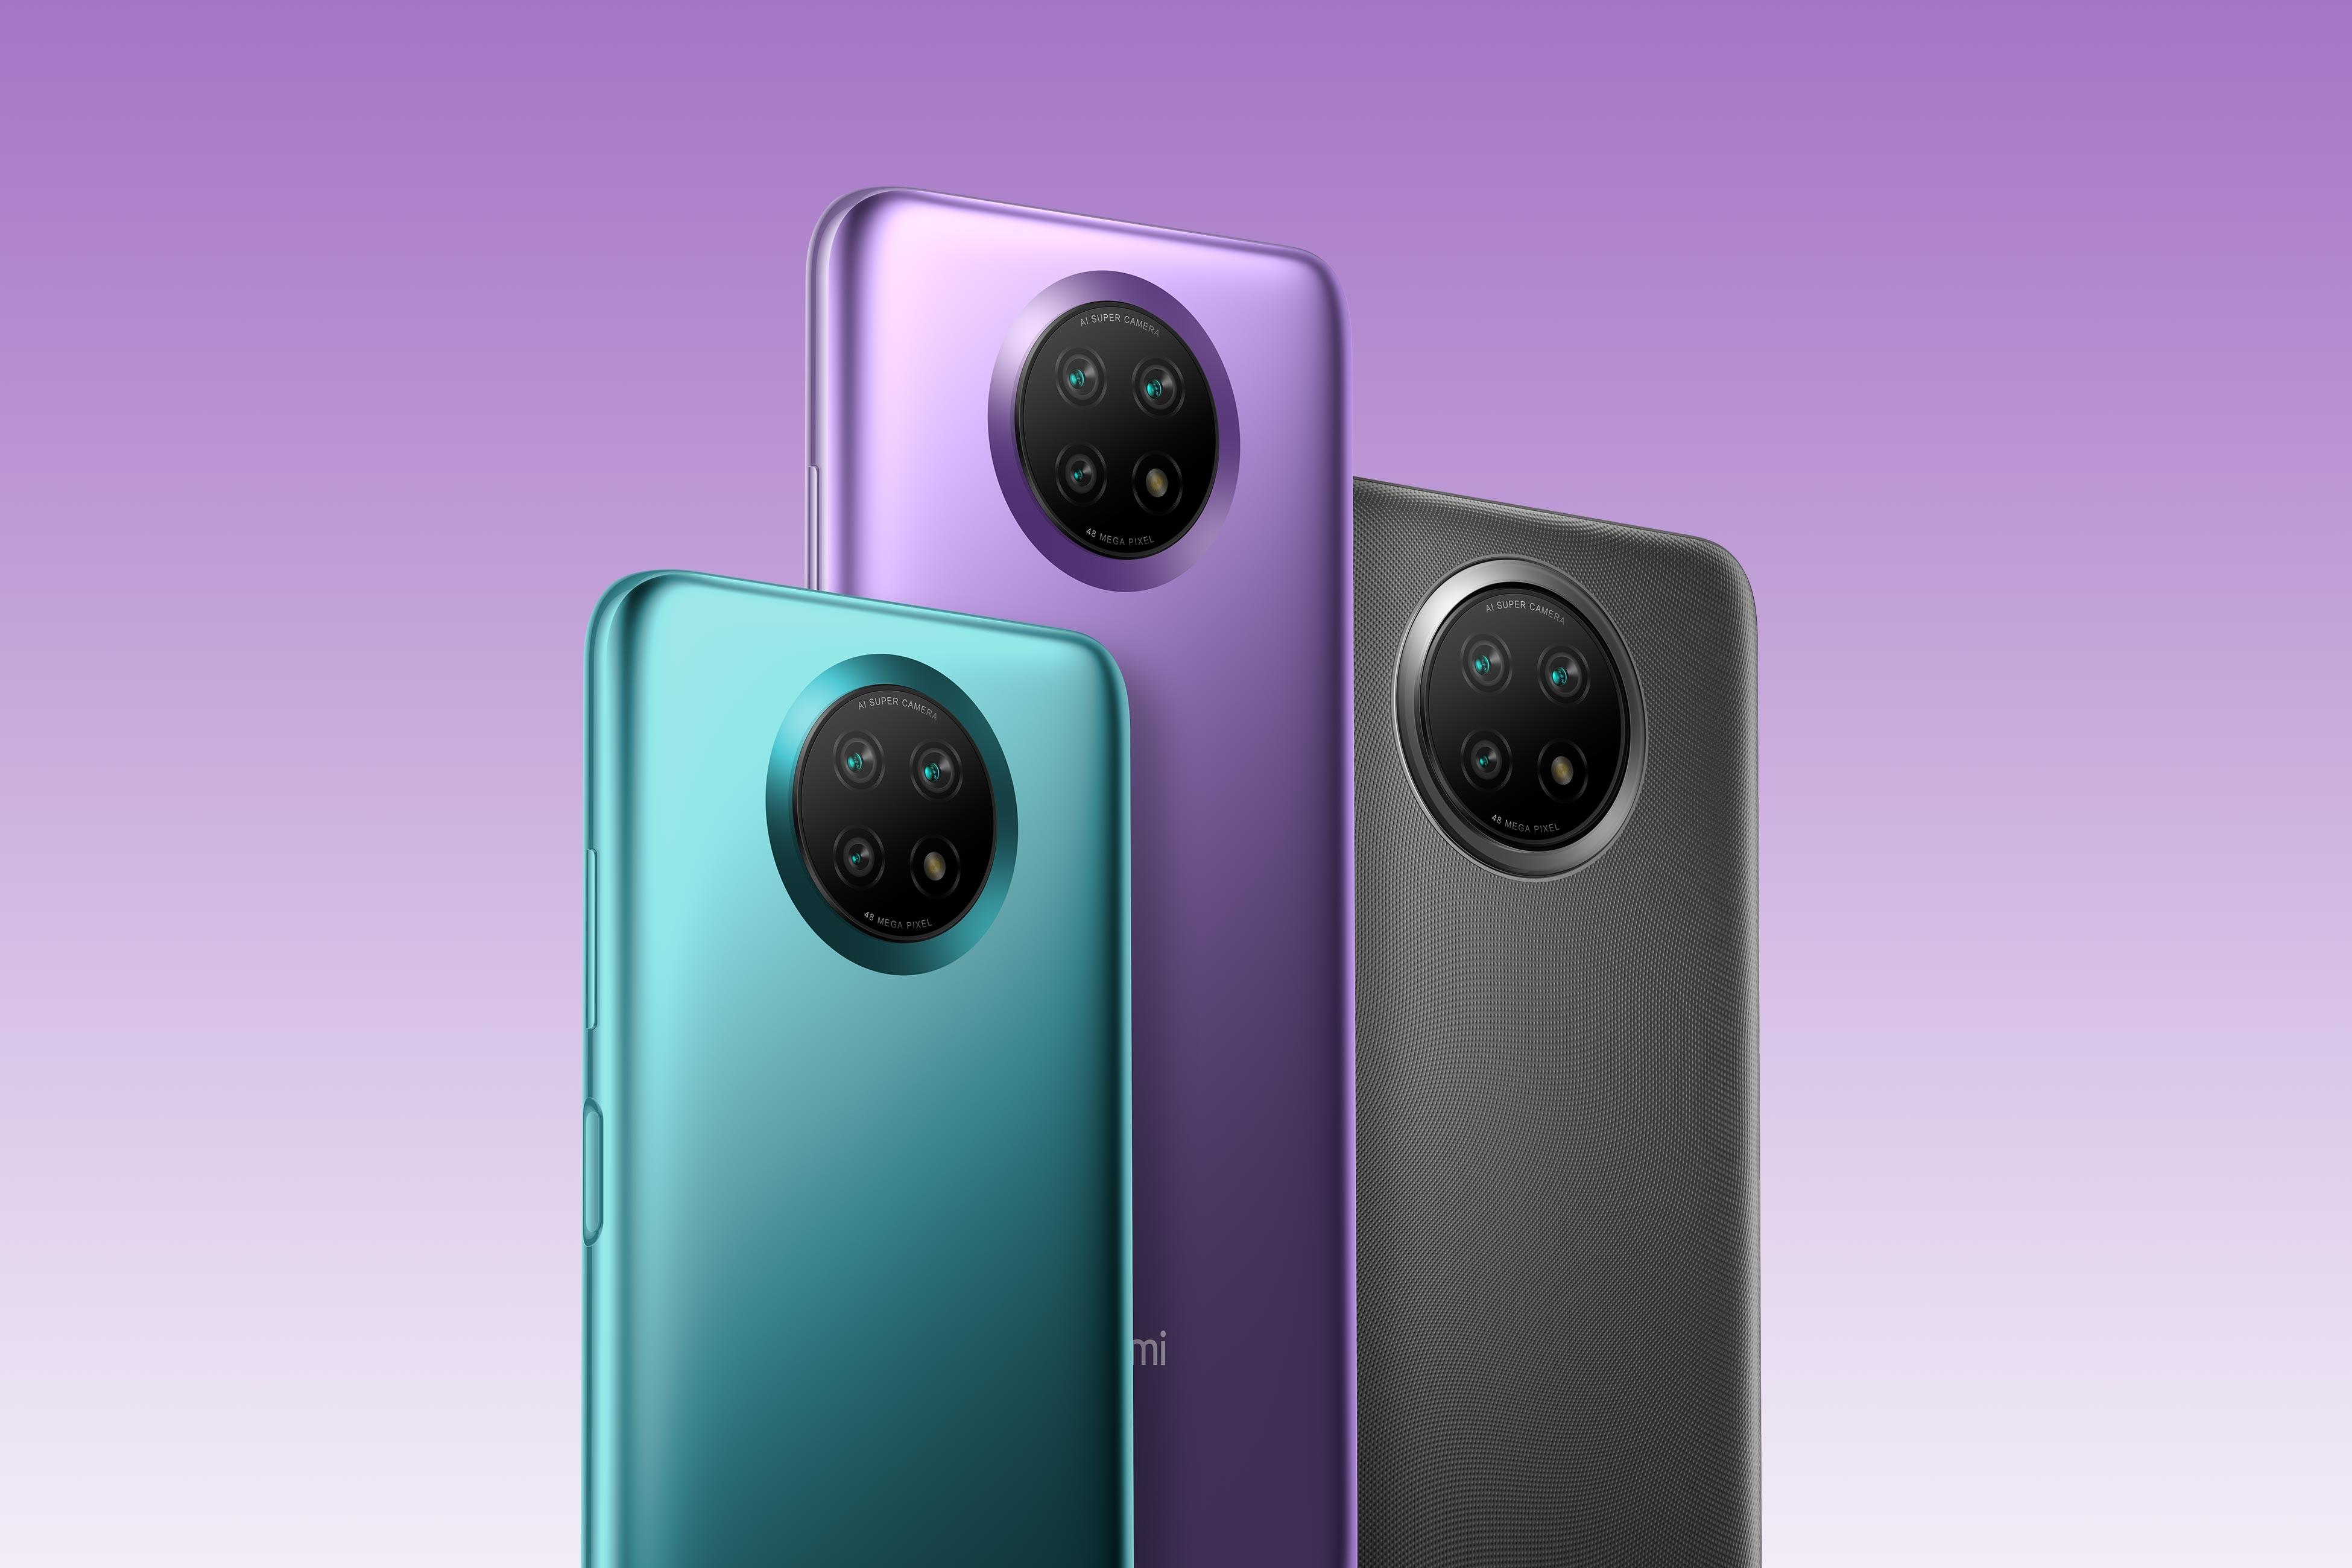 smartfon Redmi Note 9 5G smartphone